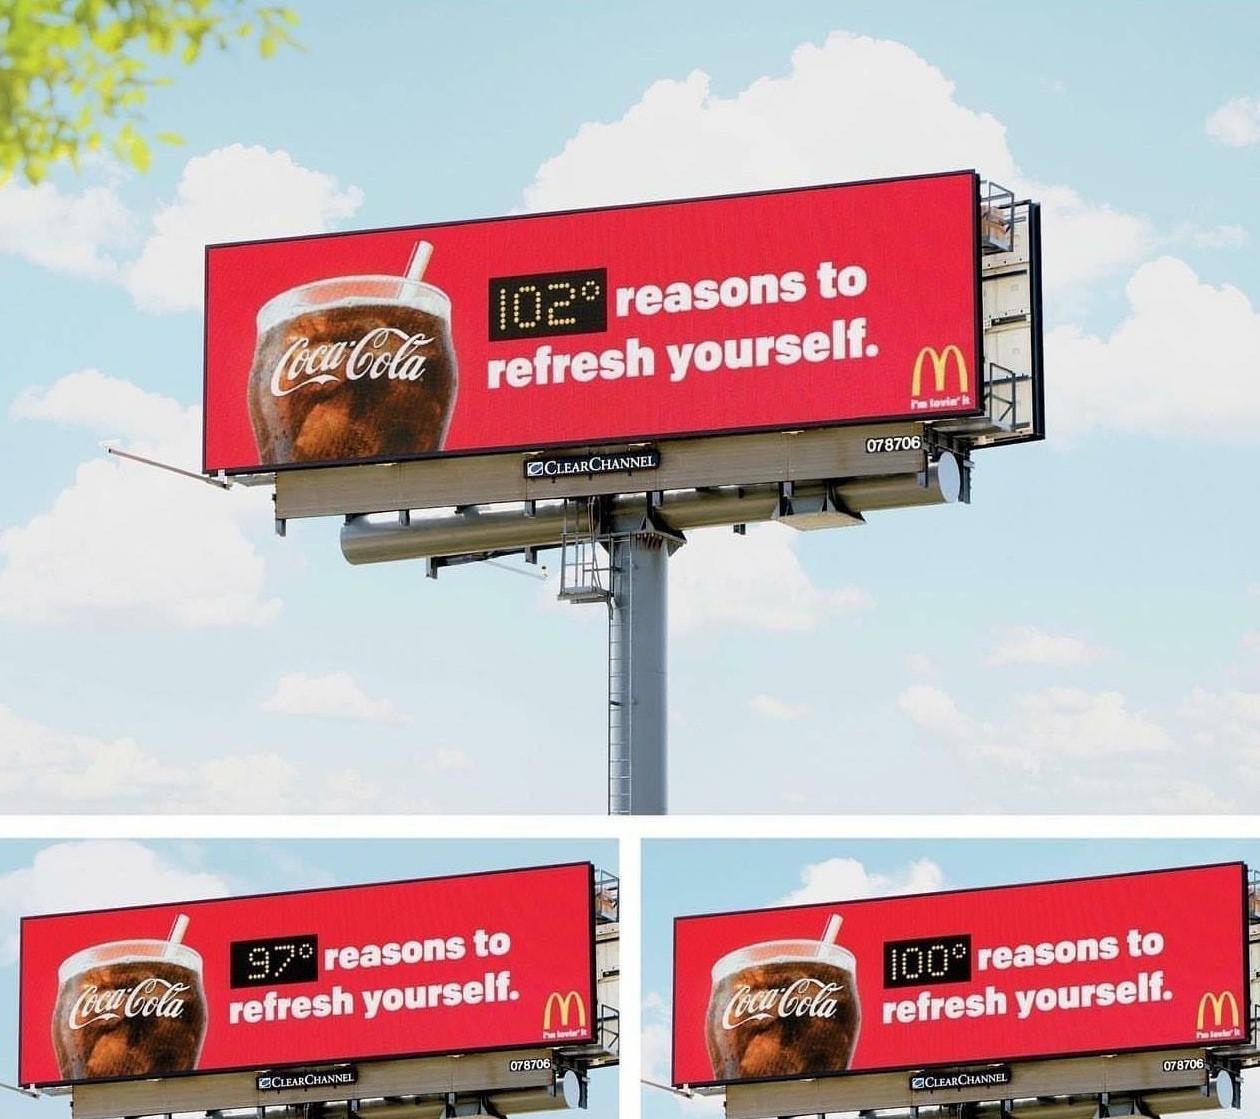 Refresh yourself print campaign by Coca Cola